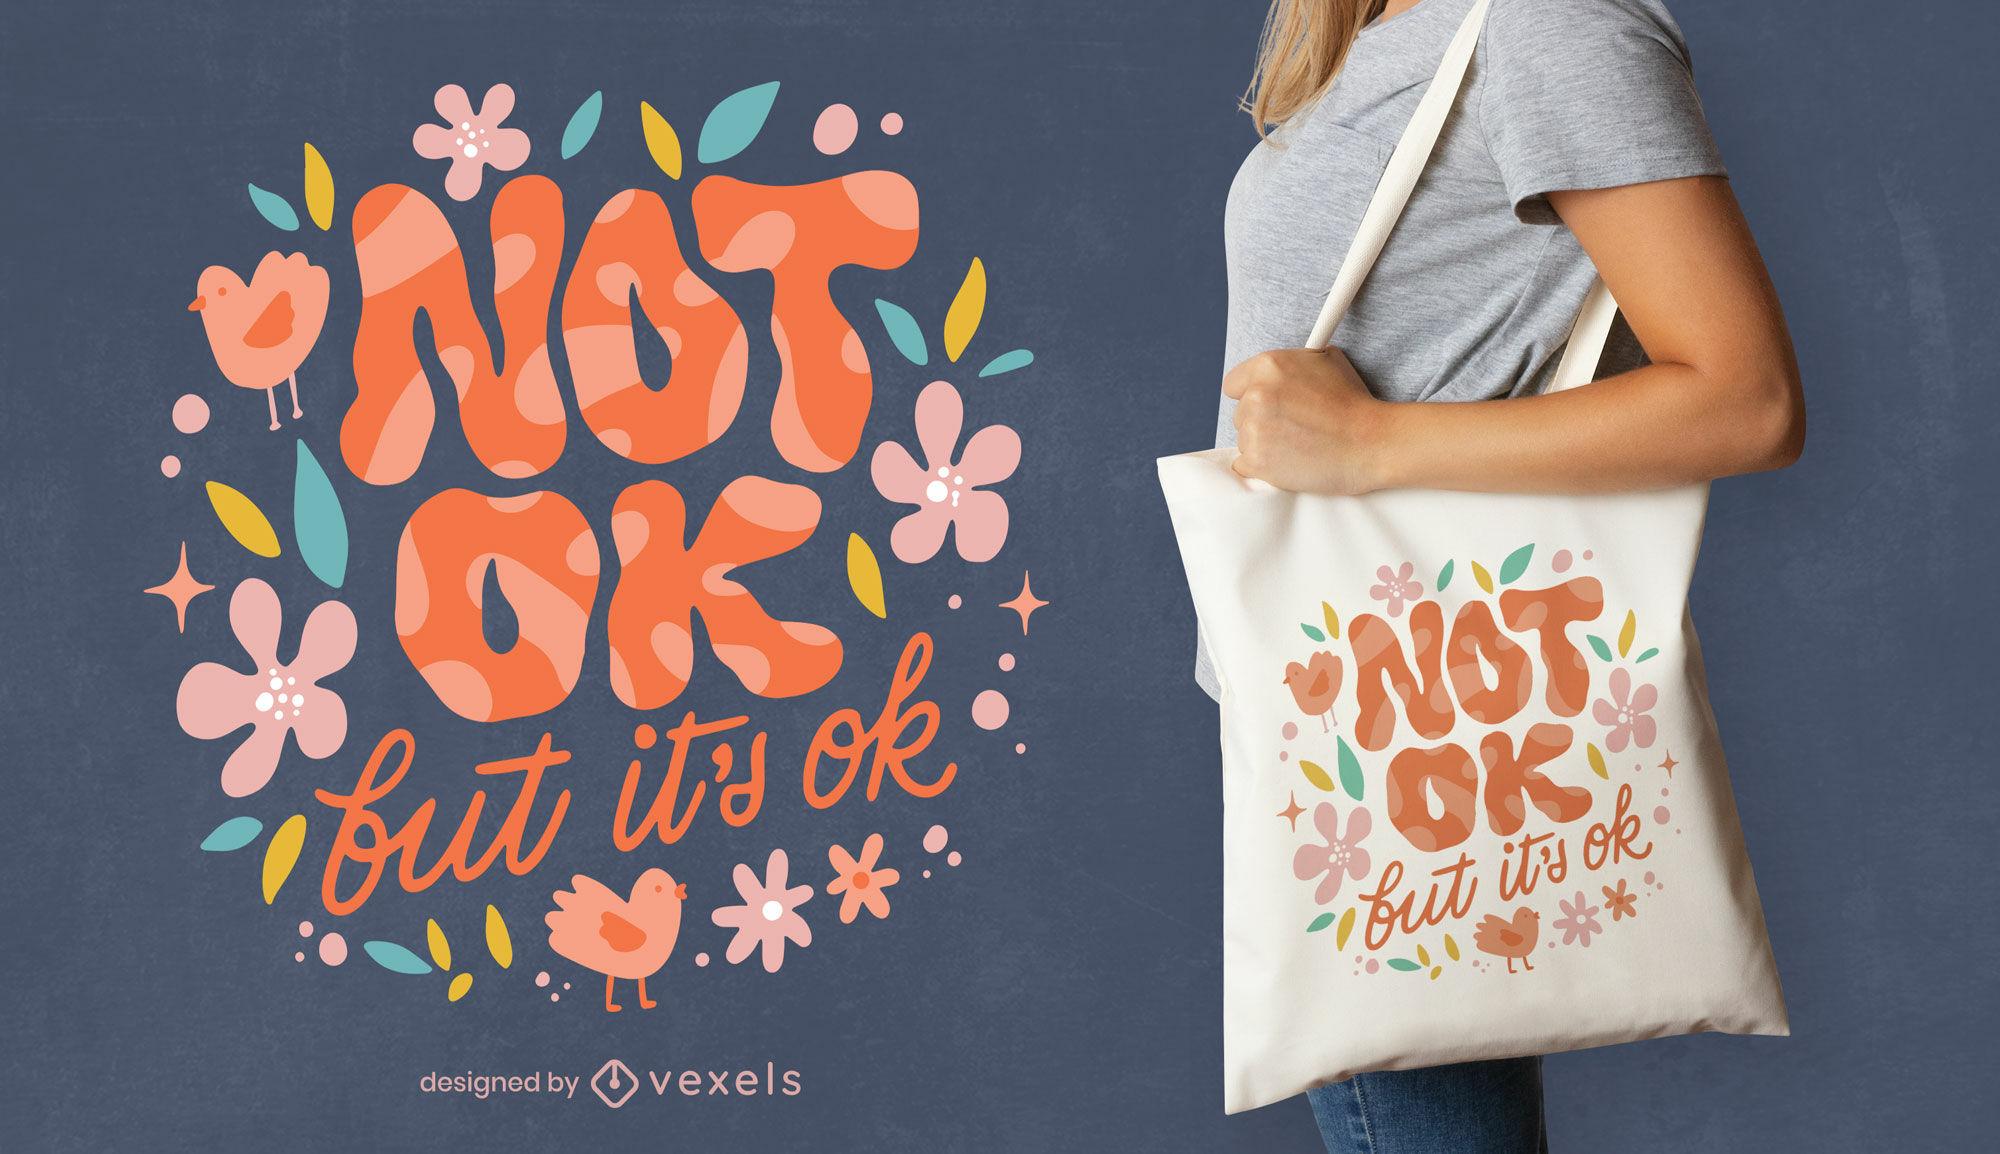 Motivational neurodiversity tote bag design